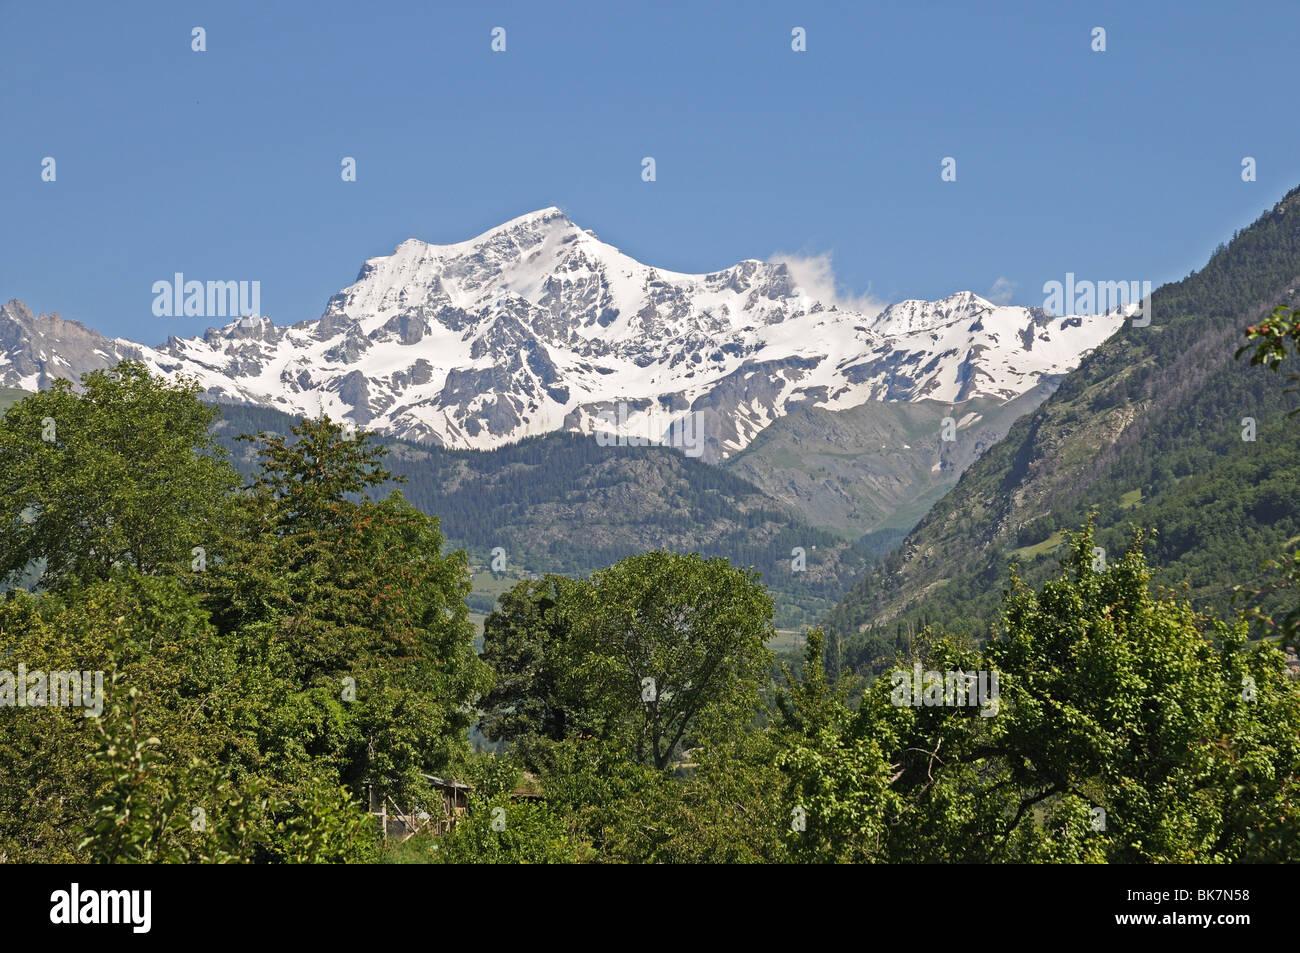 Alpine peak of Grand Combin seen from Valle del Gran San Bernardo Great St Bernard Valley north of Aosta Italy - Stock Image